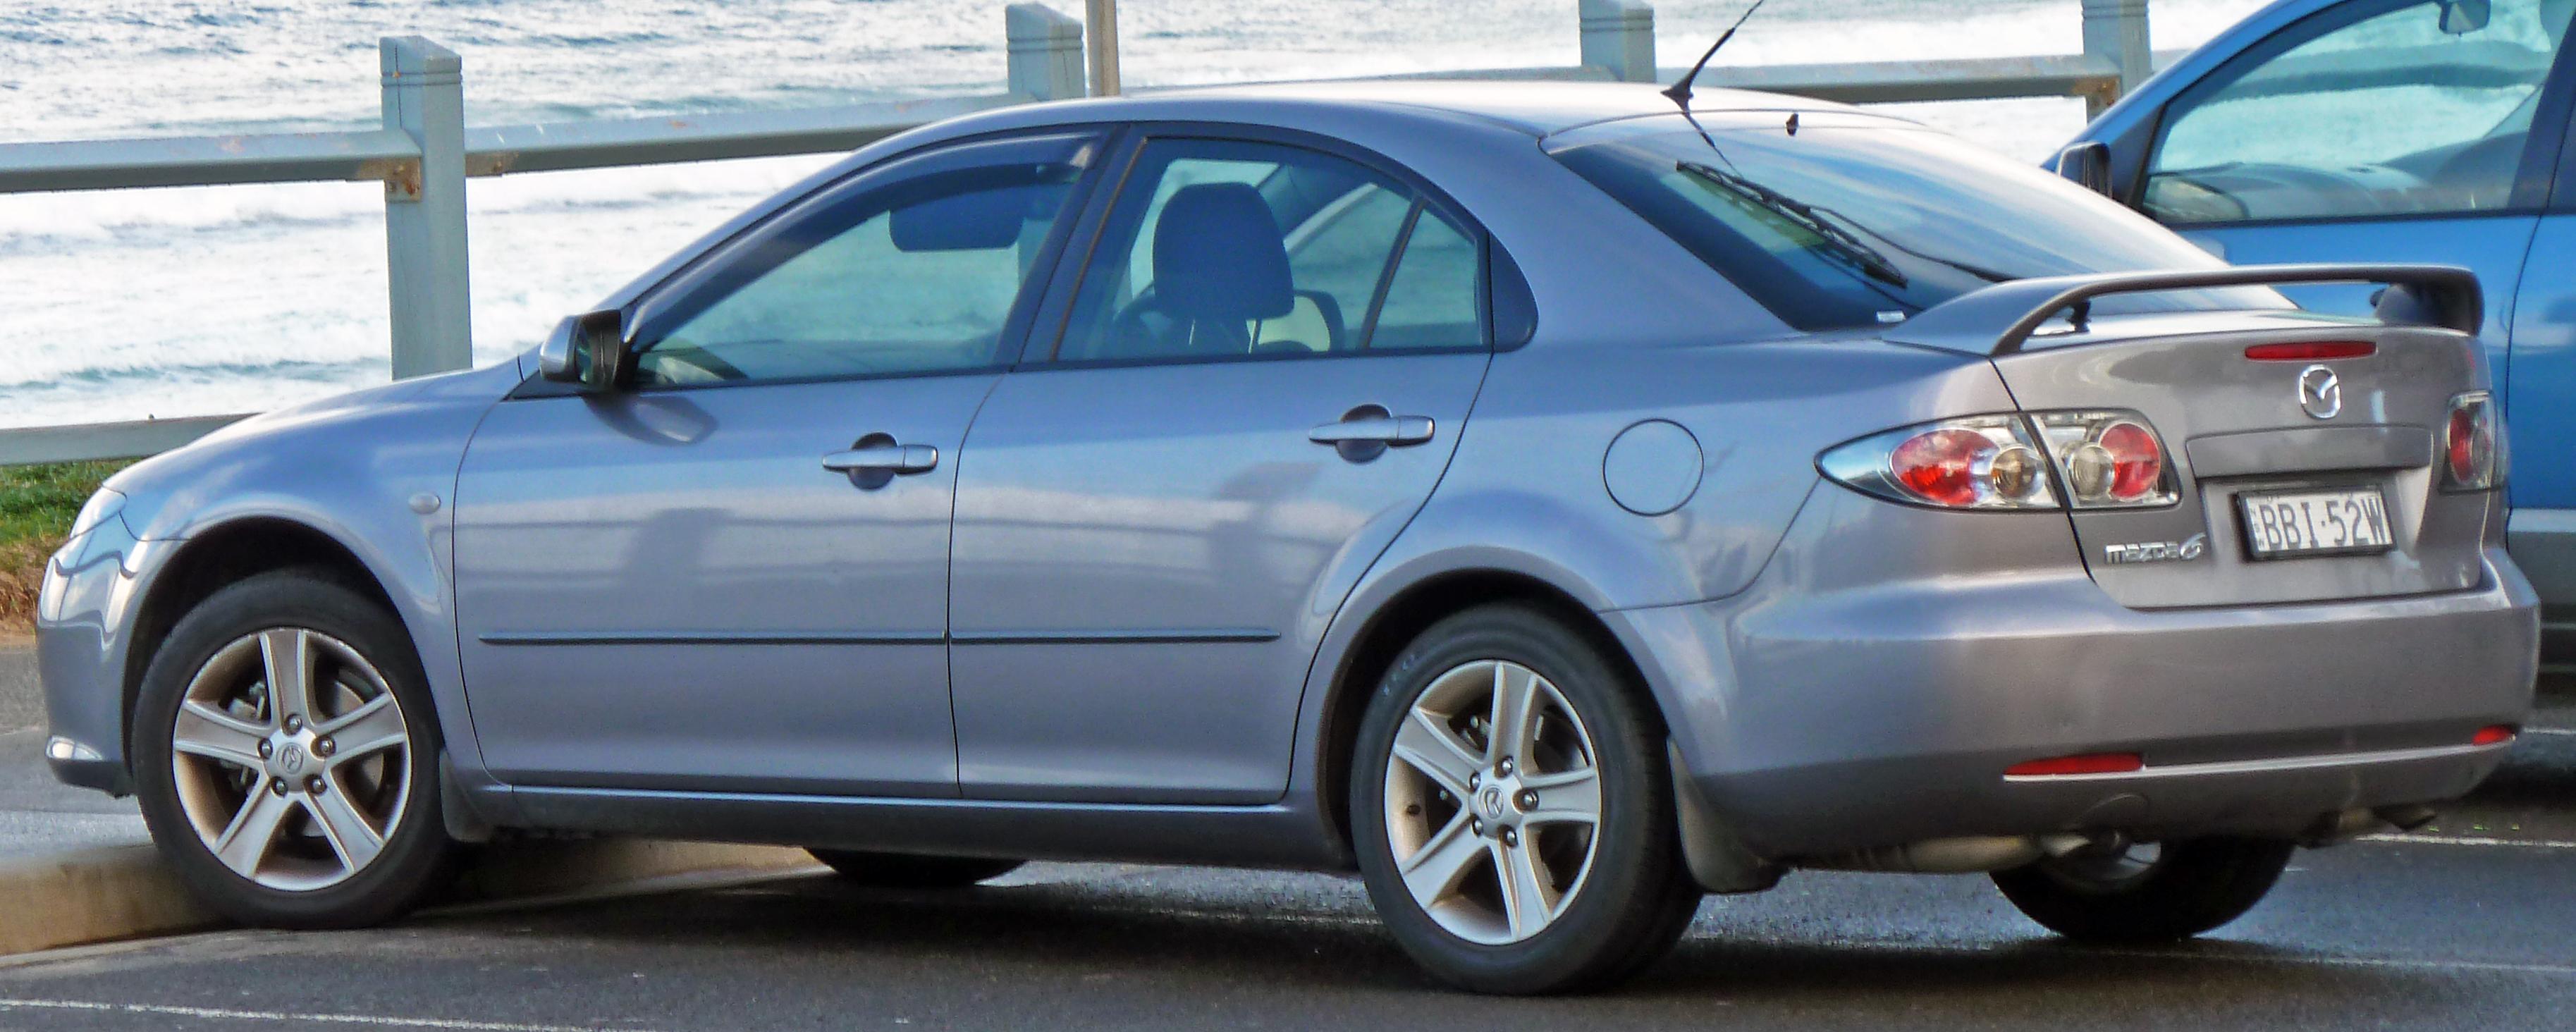 file:2005-2007 mazda 6 (gg series 2) classic hatchback 03